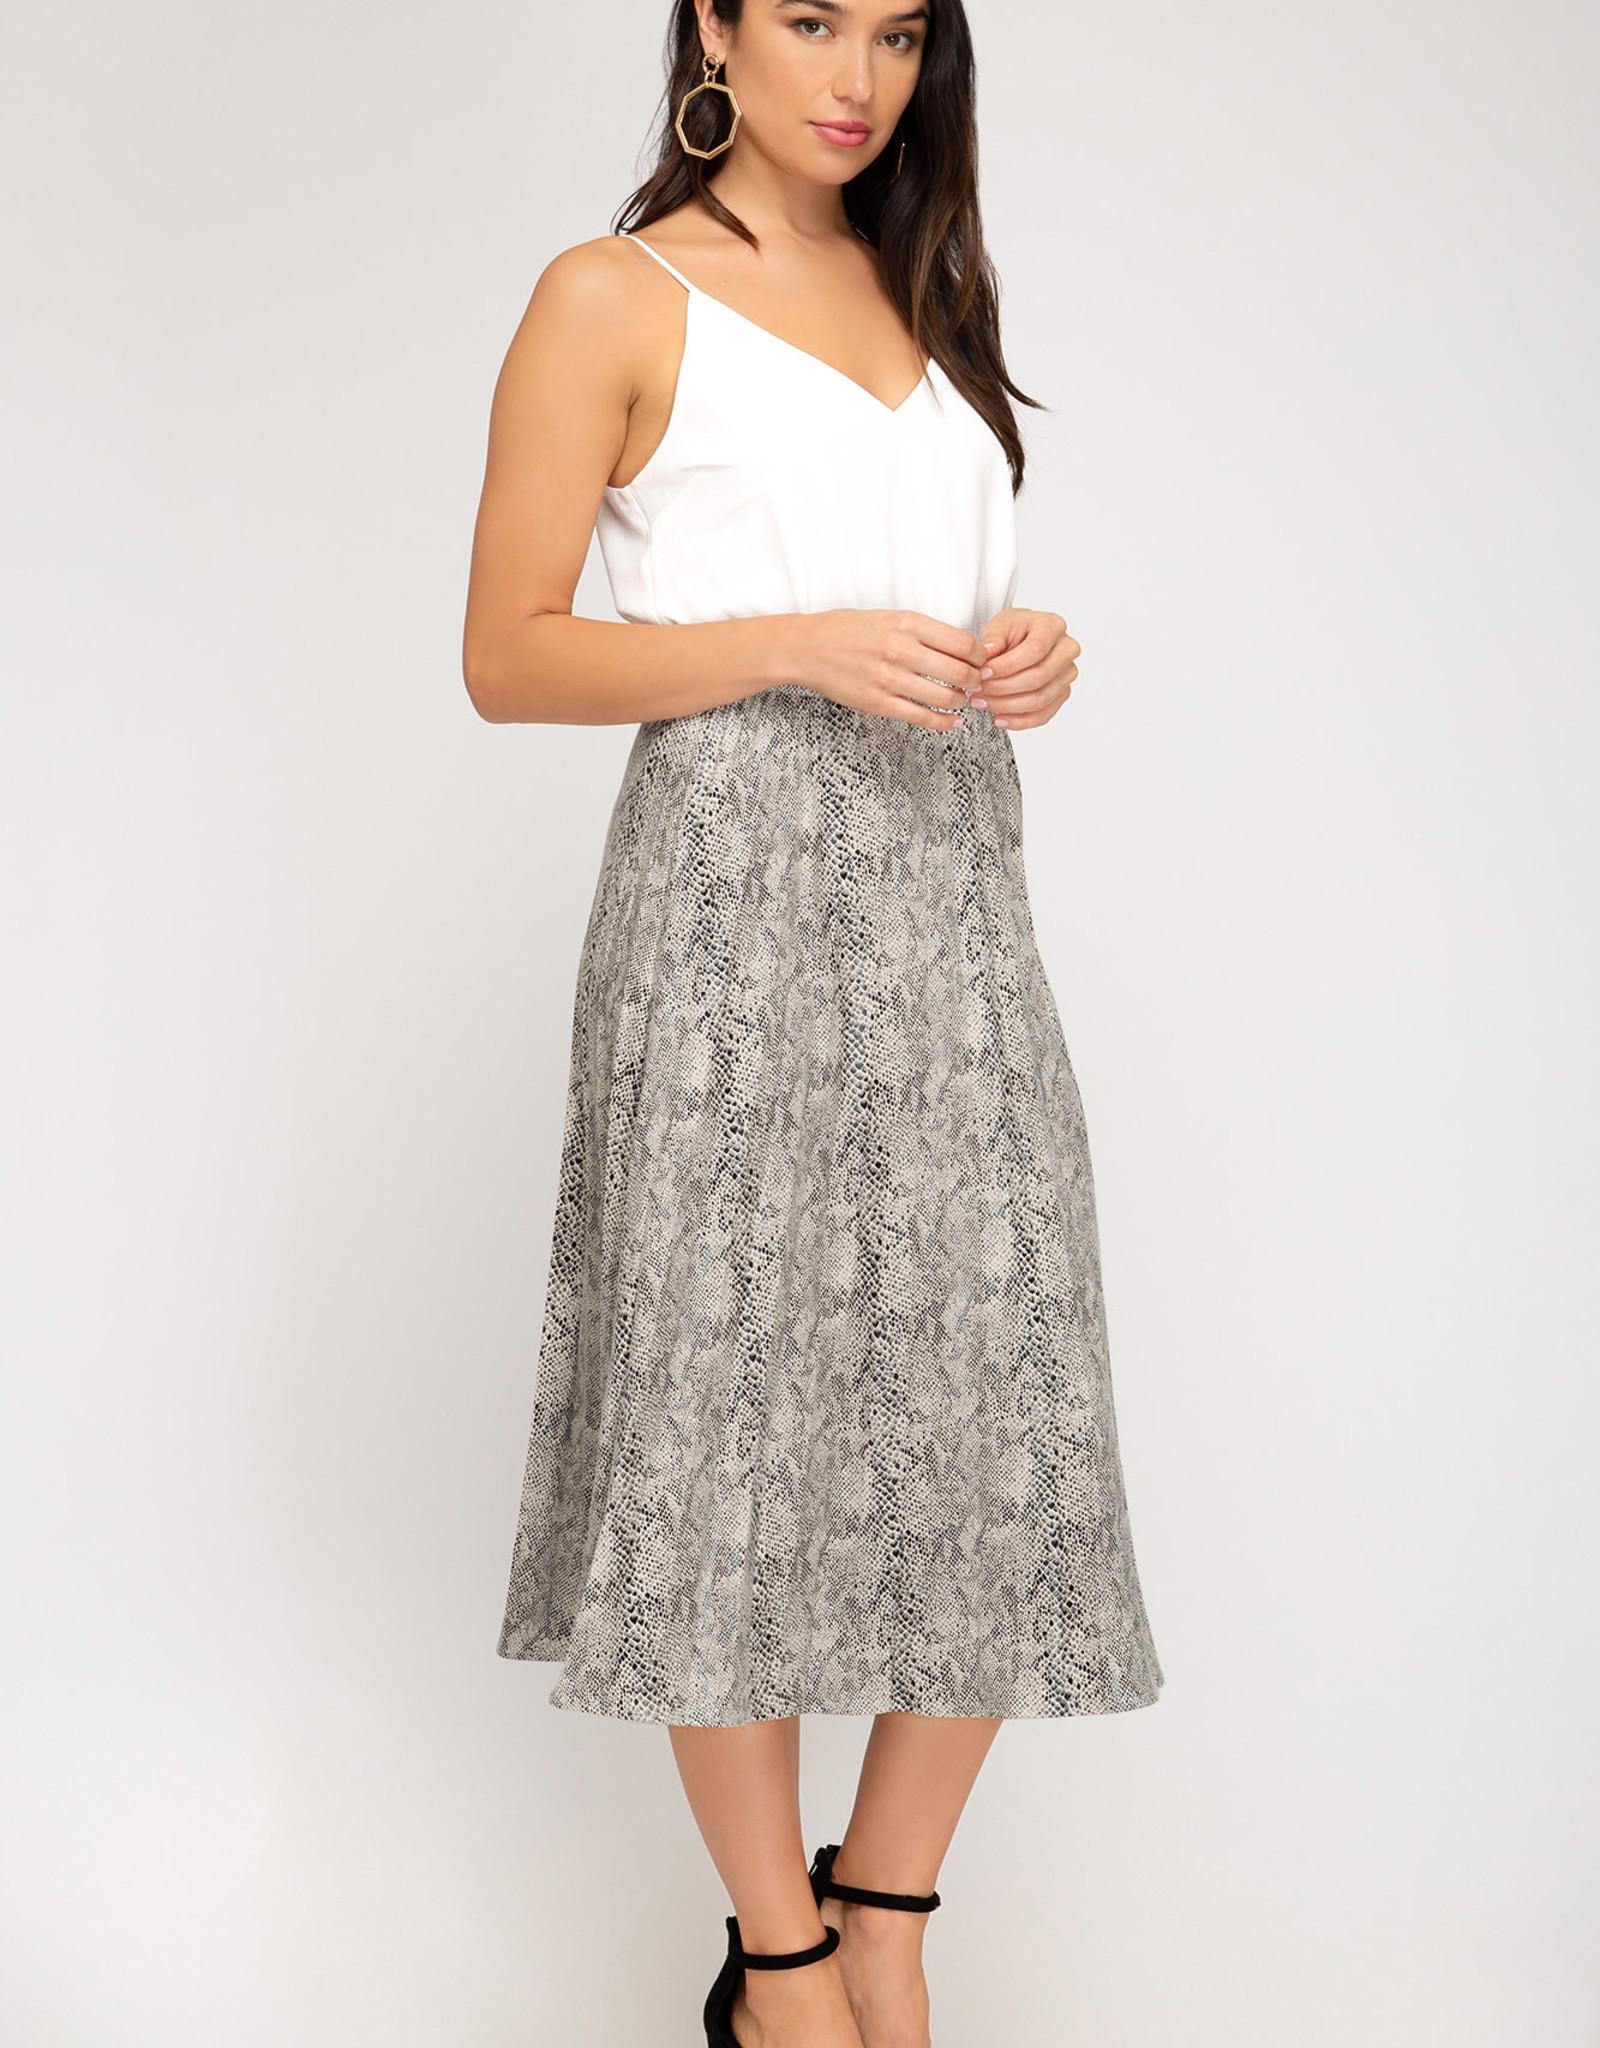 LeBLANC finds PLEATED SNAKE skirt